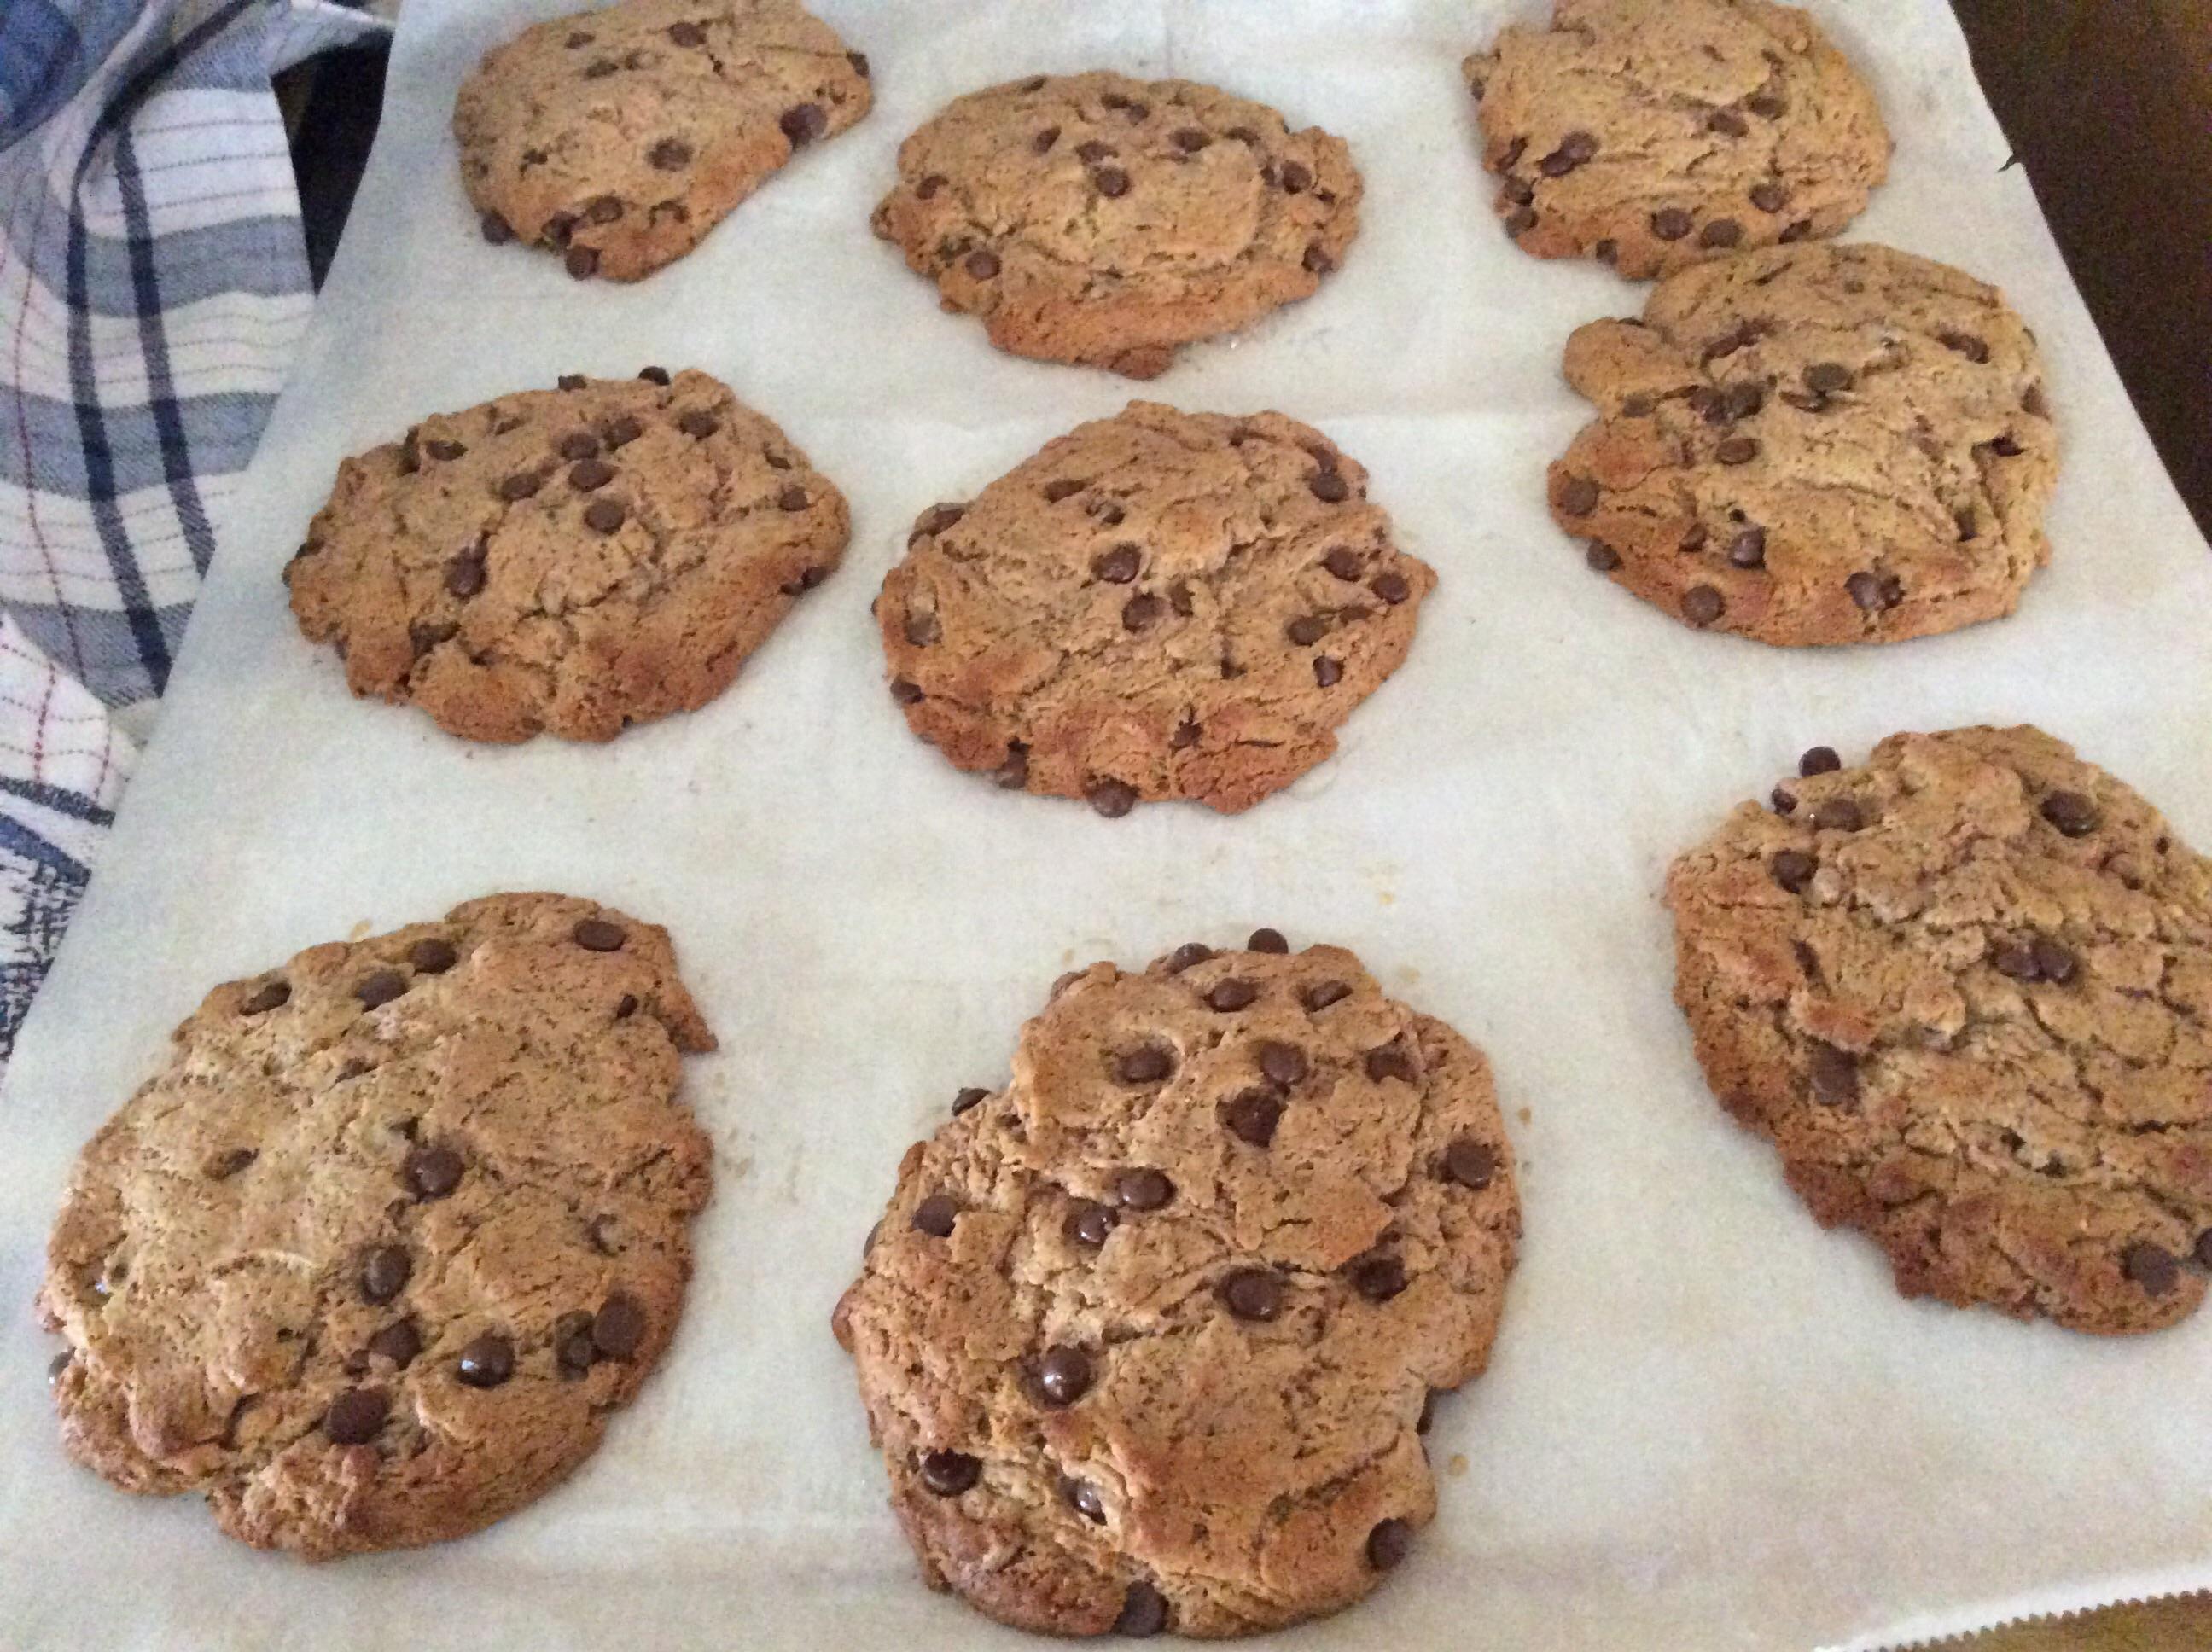 Paleo Chocolate Chip Cookies Patty Deering